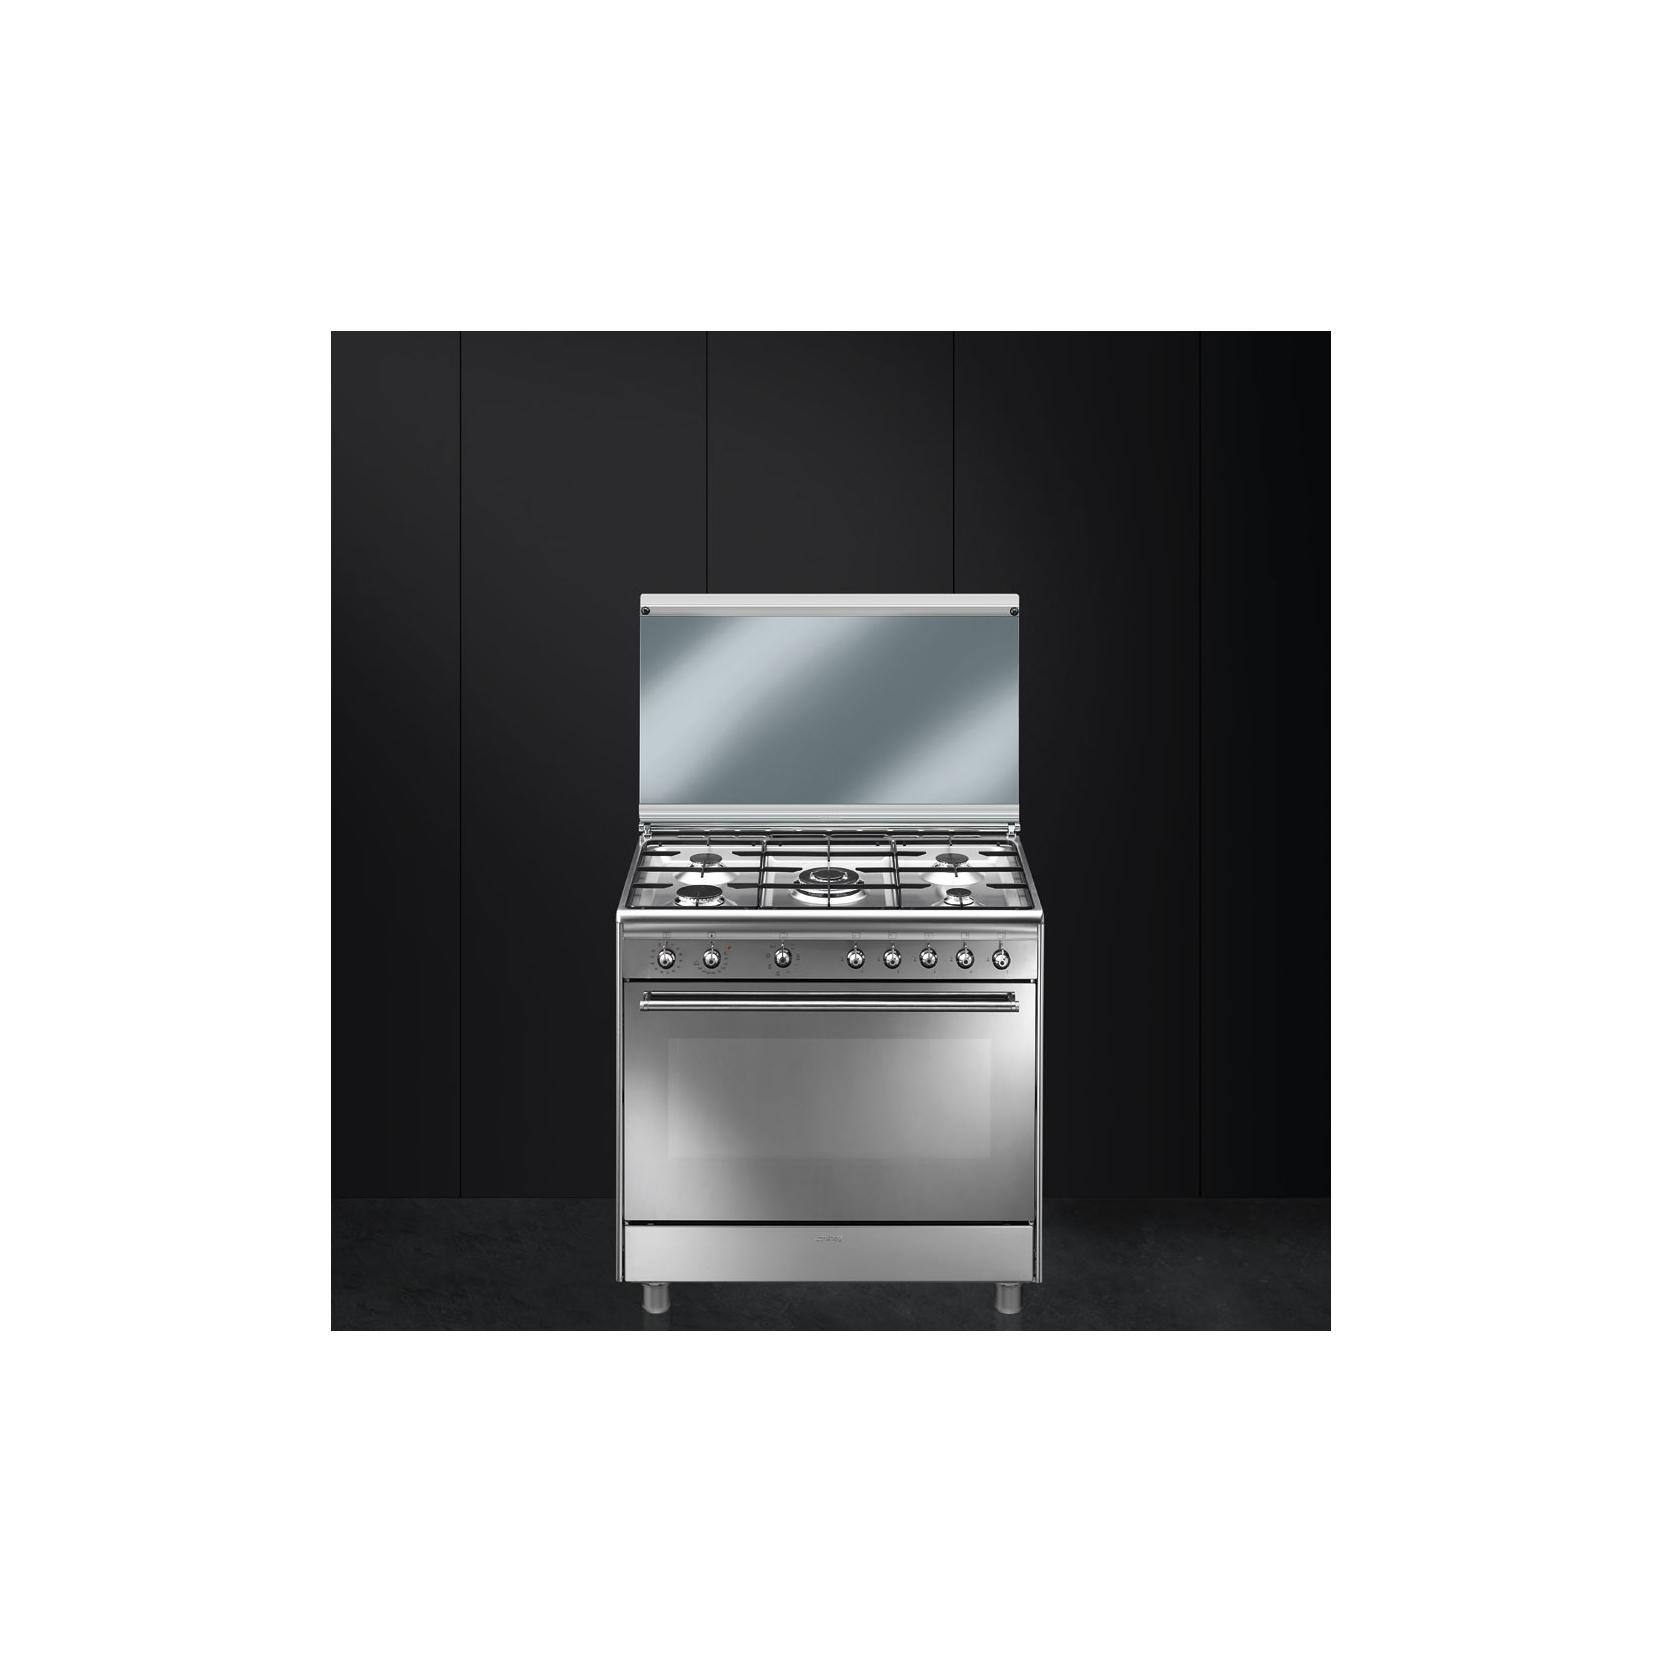 Smeg Cucine A Gas Con Forno Elettrico. Cucine Smeg Cucina Elettrica ...